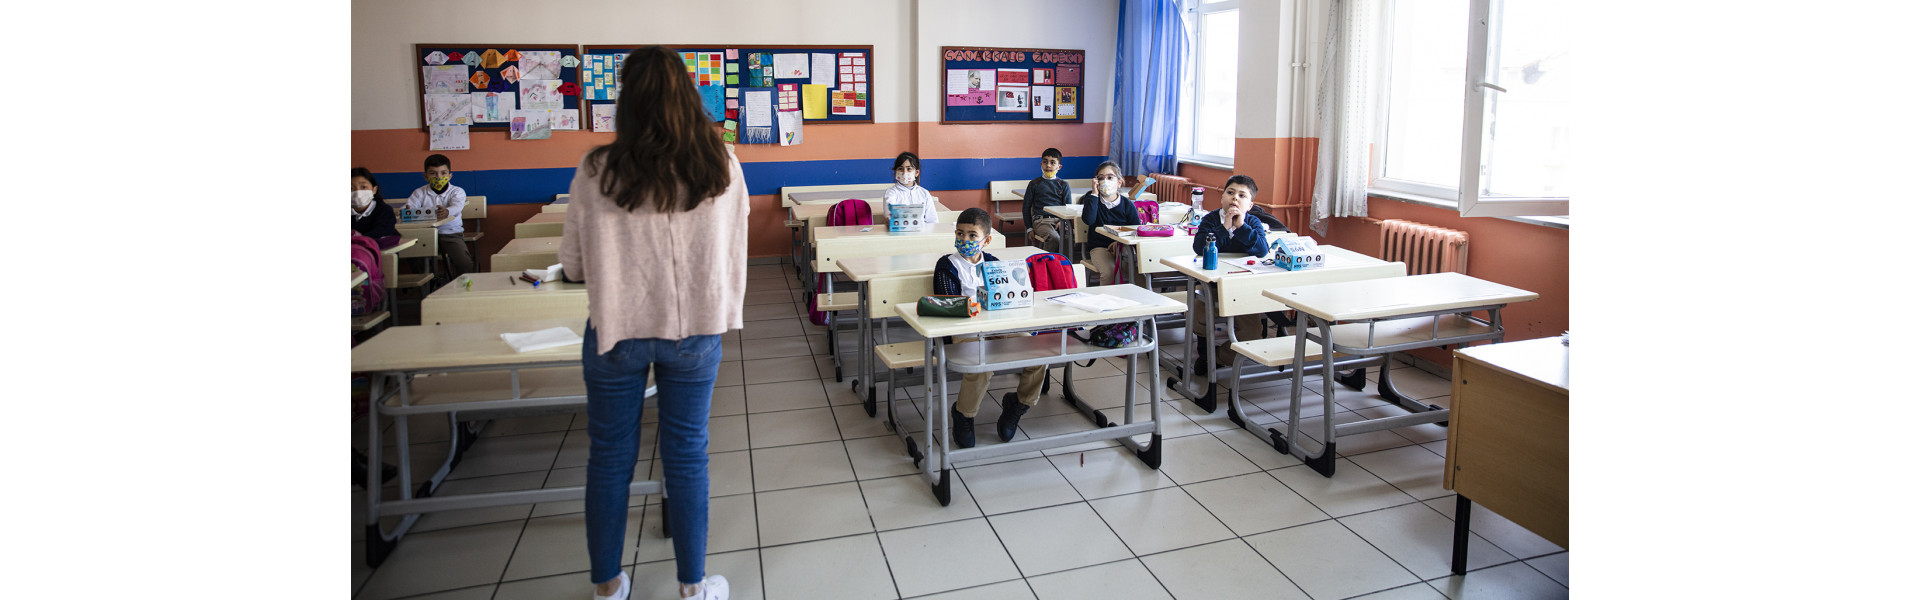 Osman Gazi İlkokulu